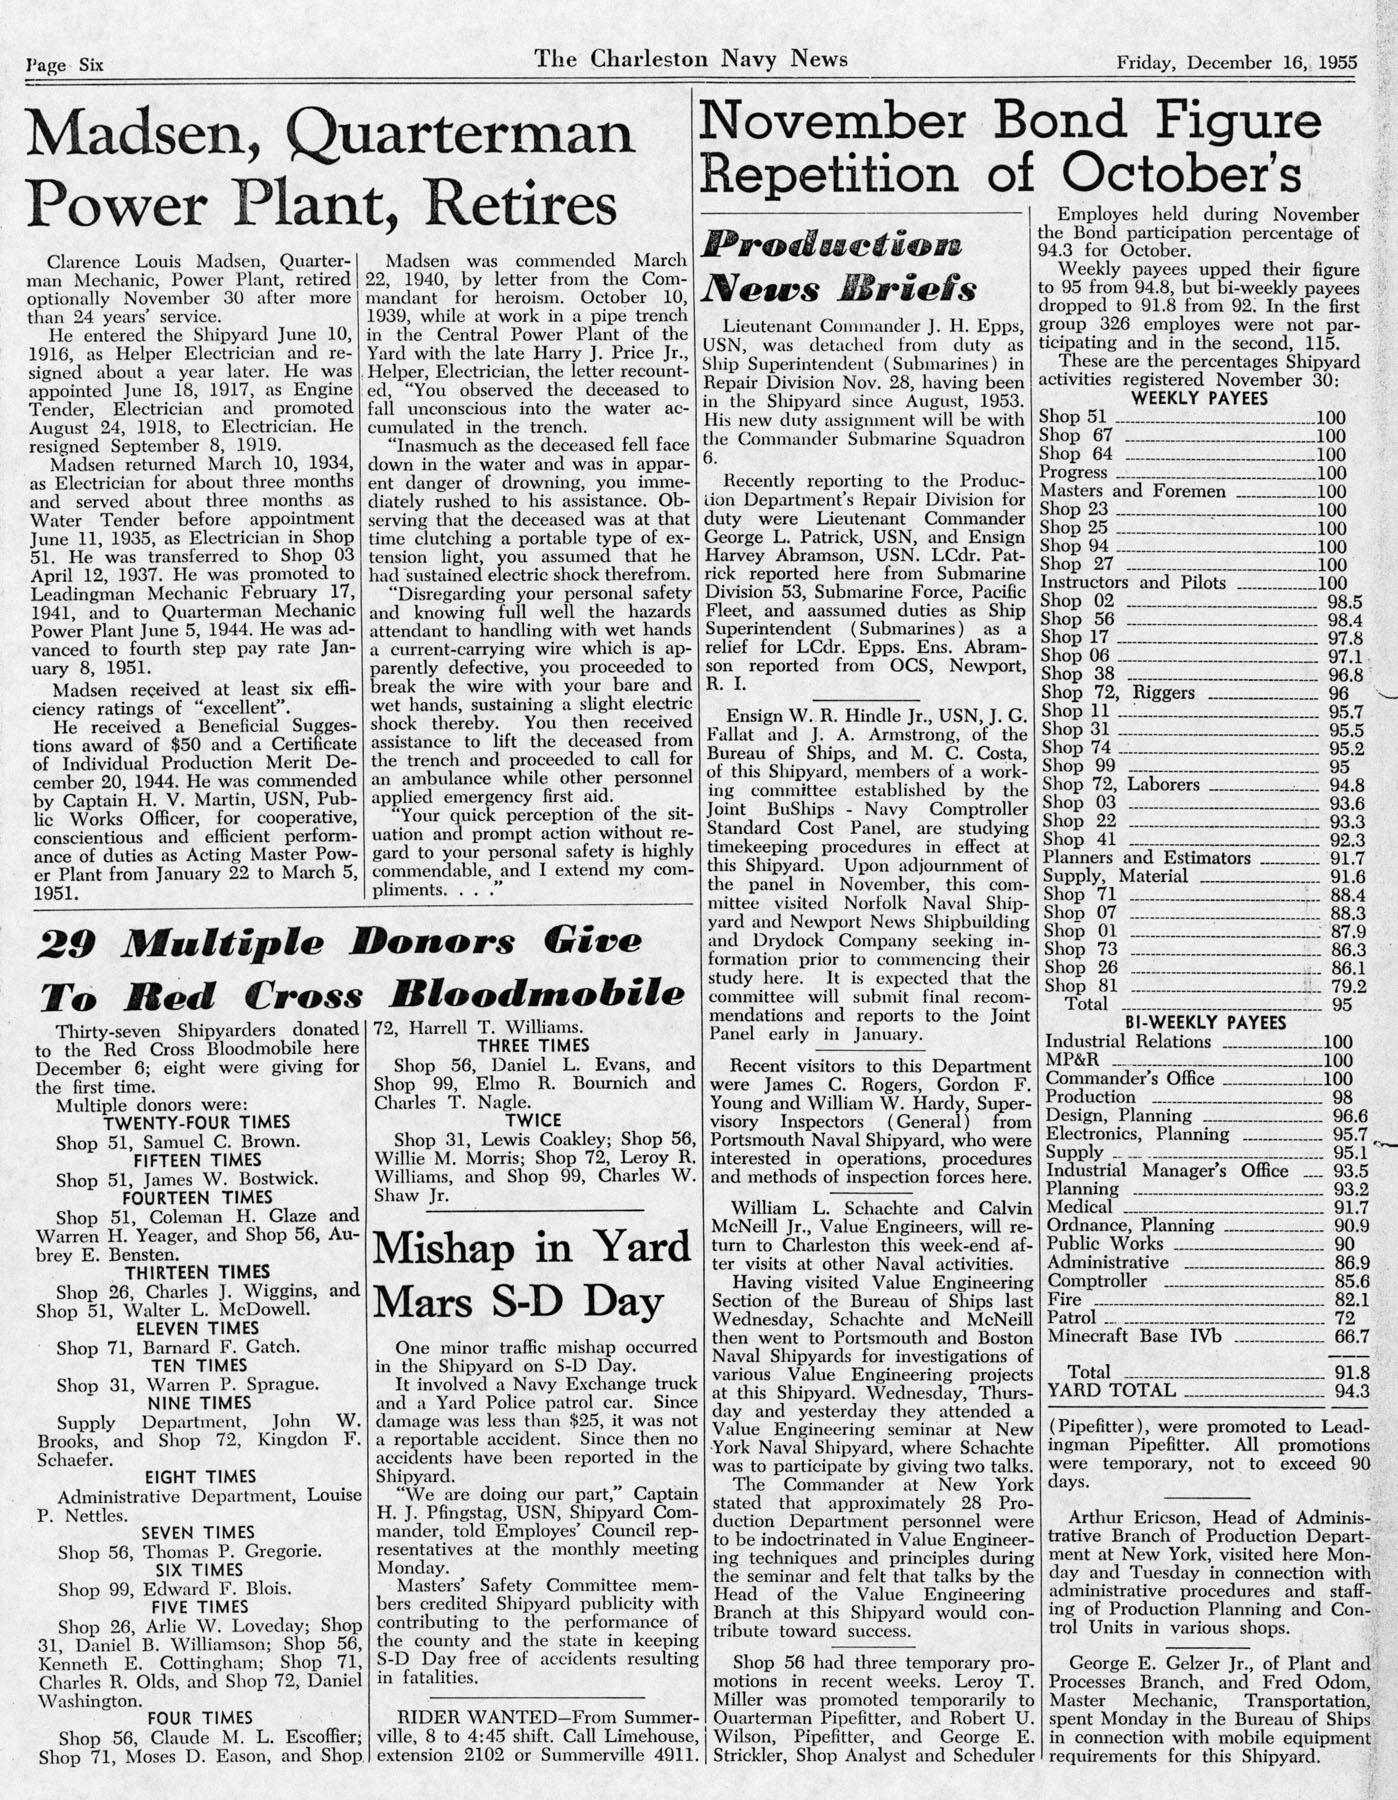 The Charleston Navy News, Volume 14, Edition 11, page vi